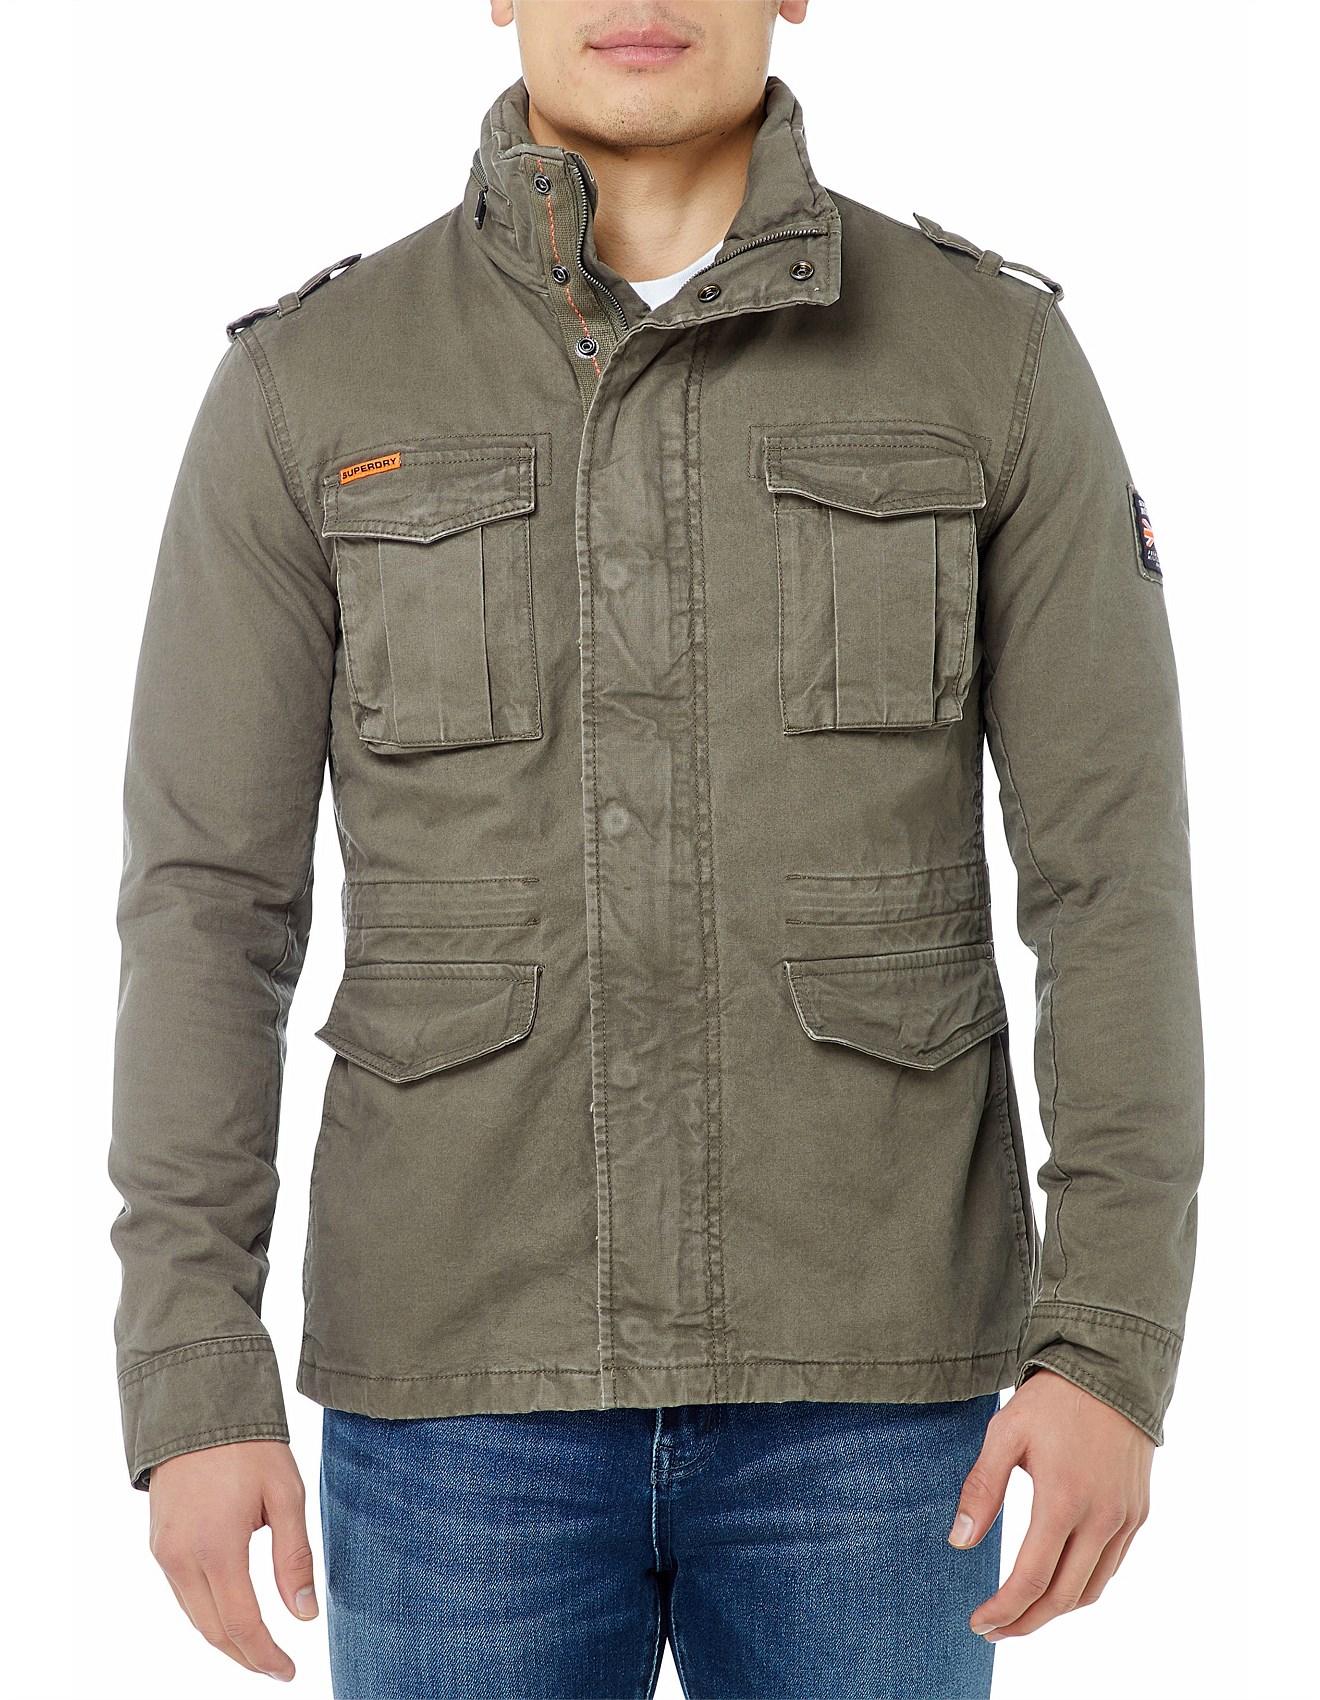 008b84669b700 Men's Jackets & Coats | Leather Jackets Online | David Jones ...